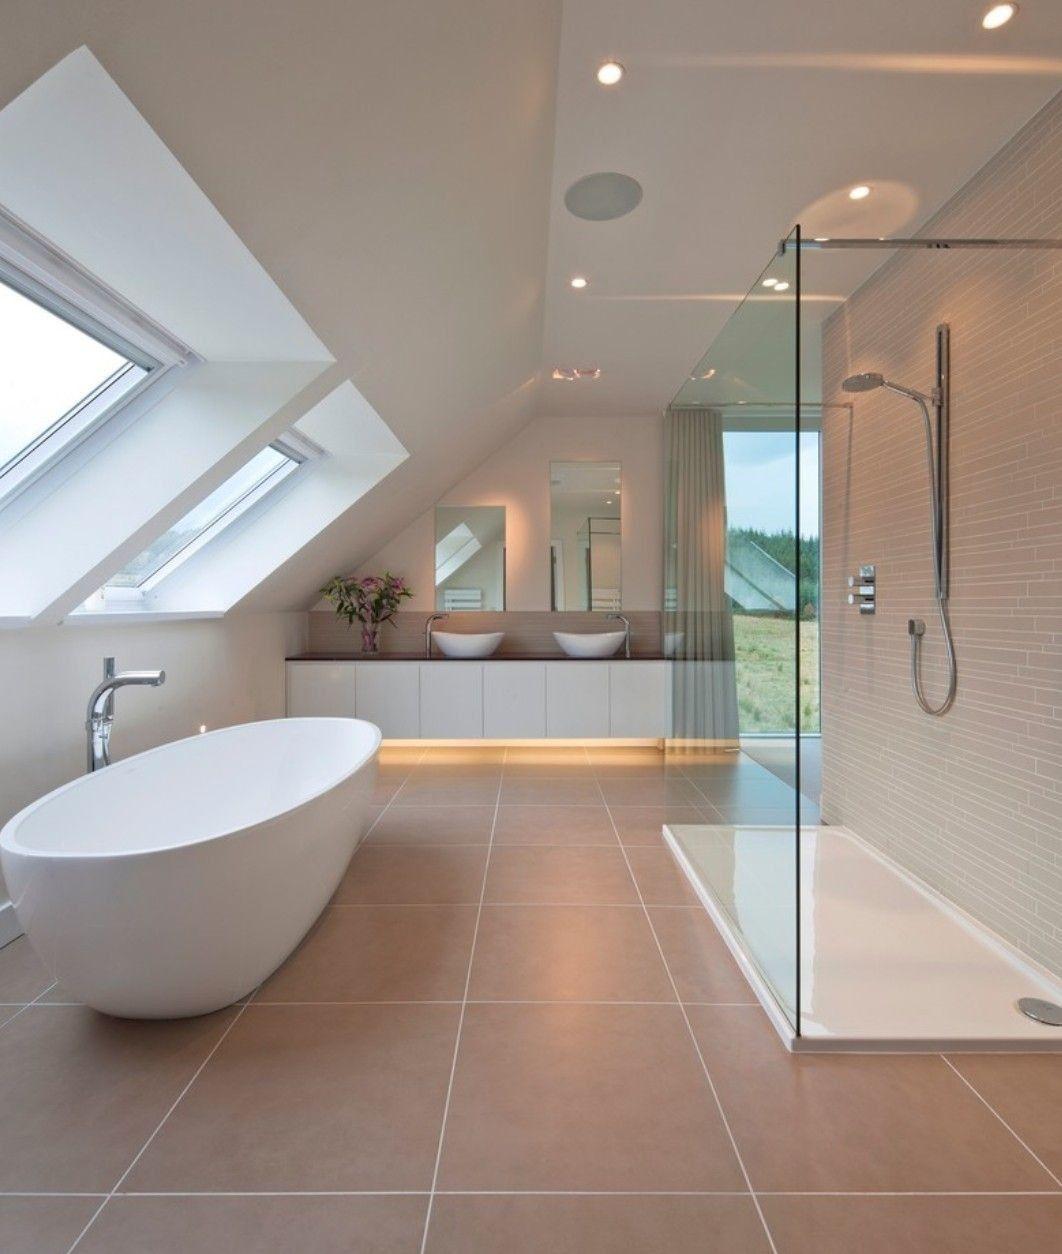 Badezimmer Traum  Badezimmer mit schräge, Badezimmer dachgeschoss